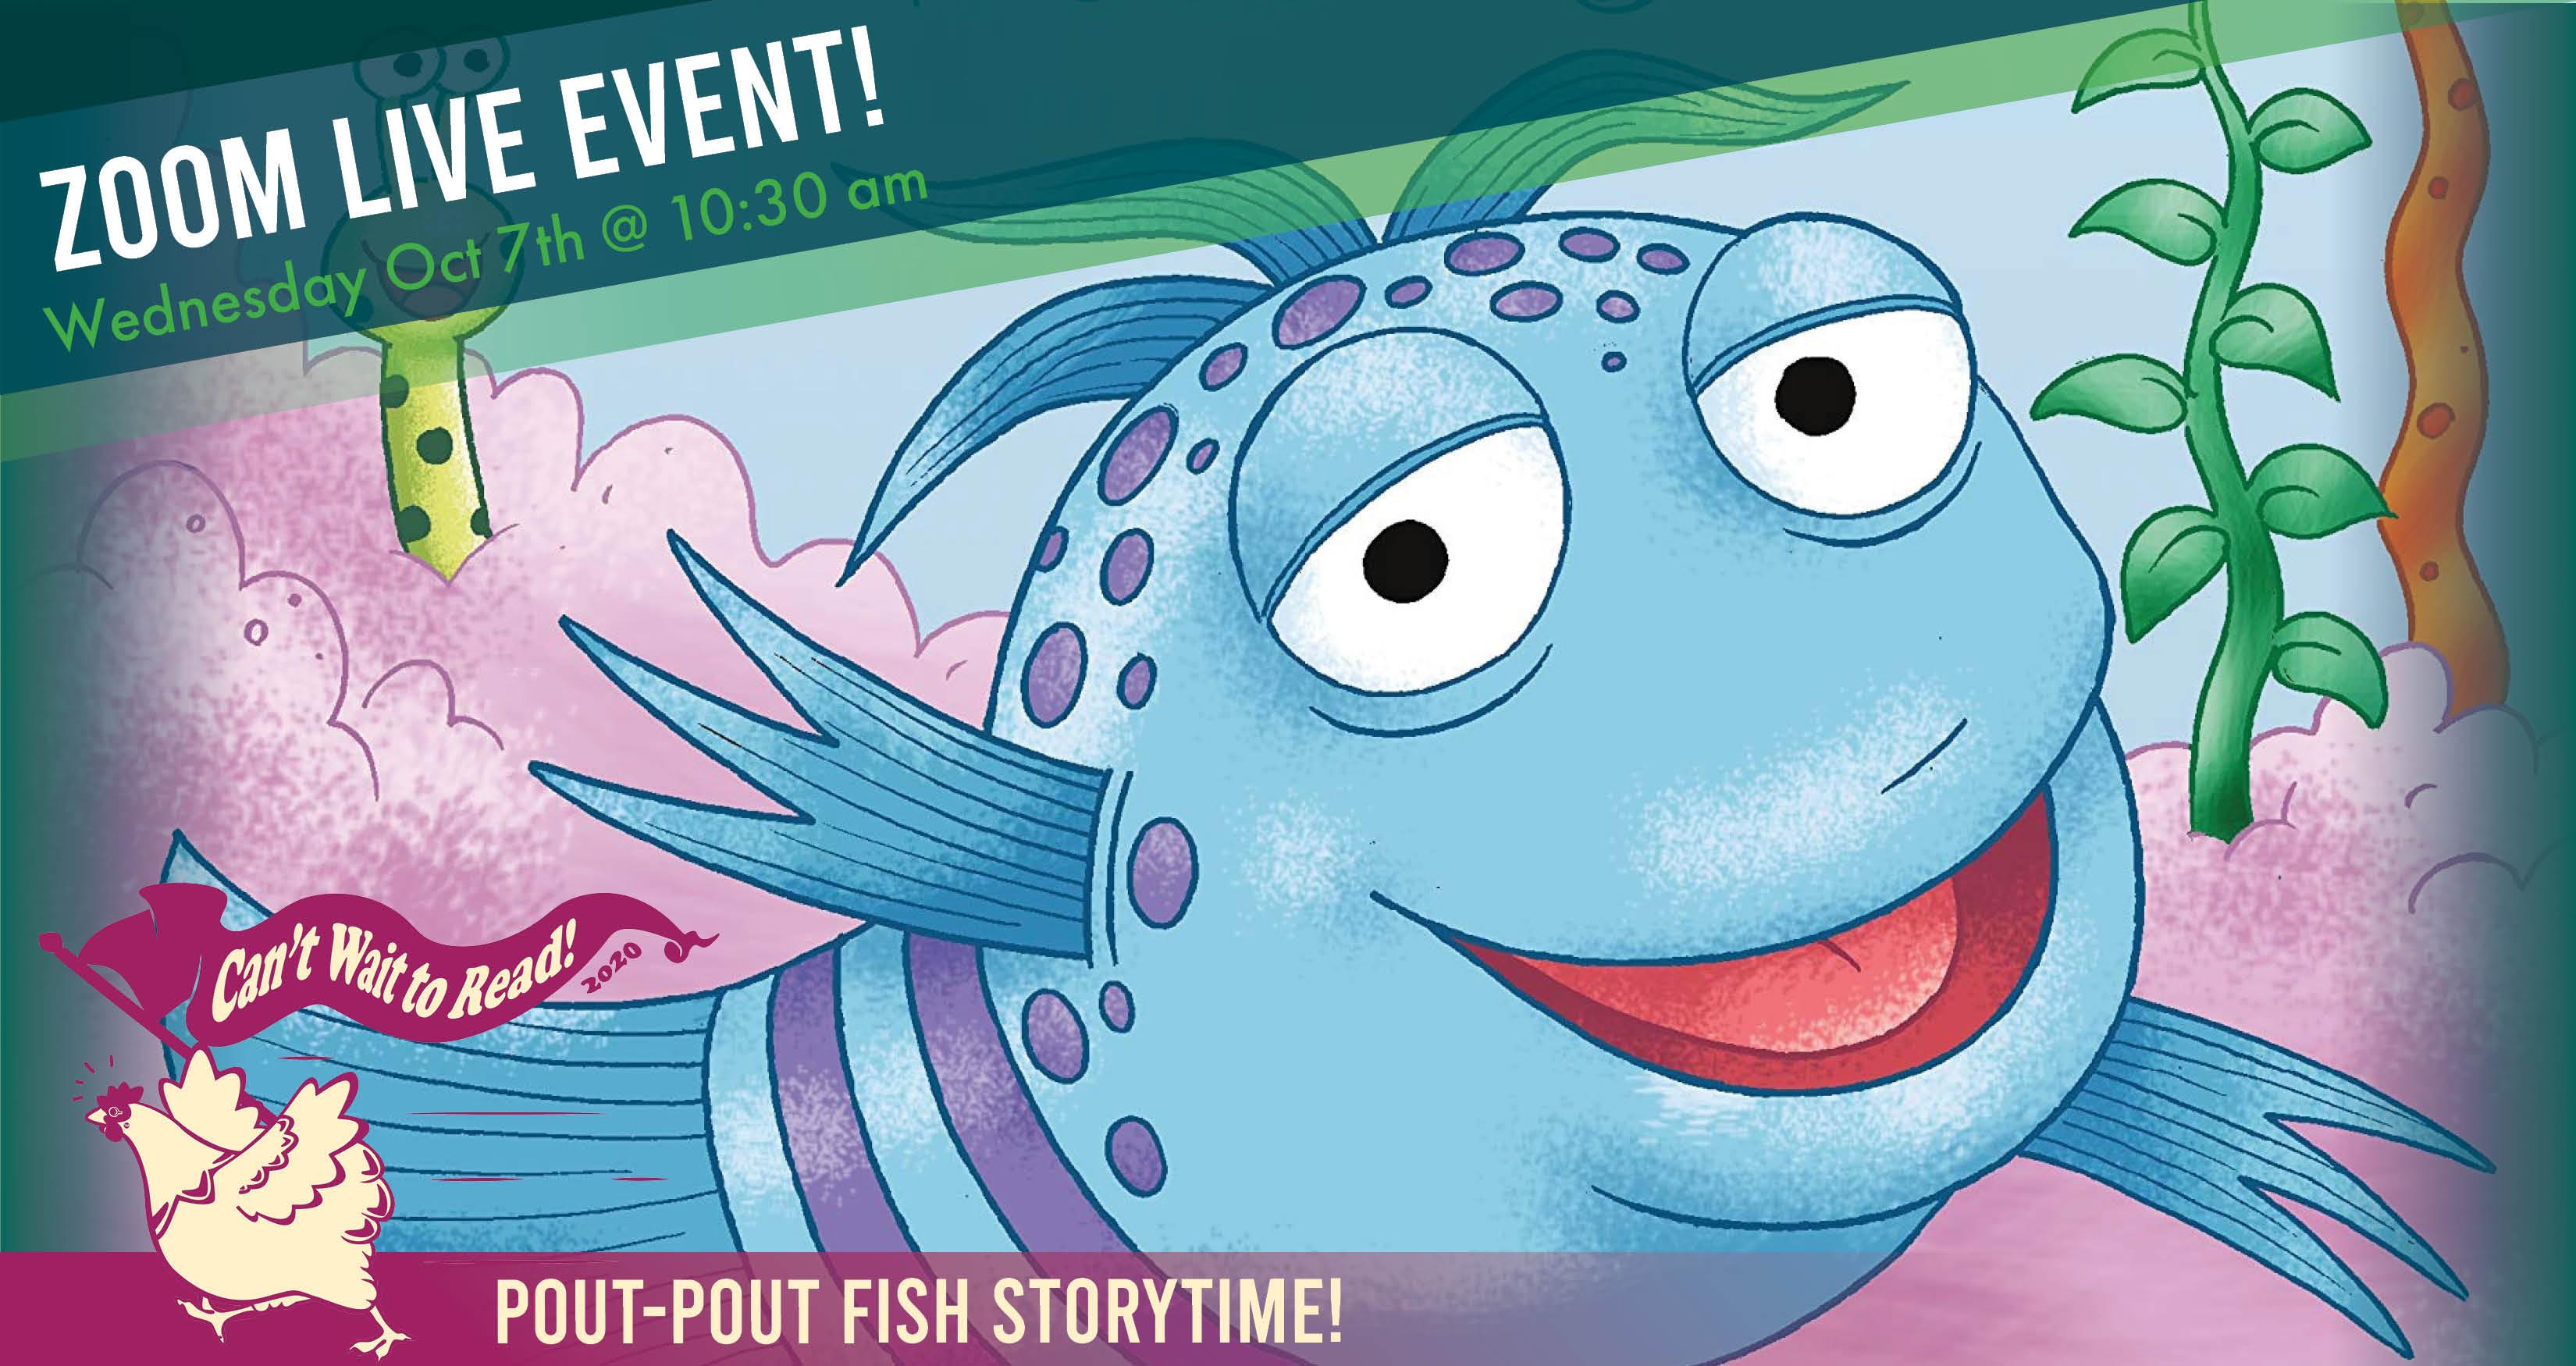 Pout-Pout Fish Story Time - Zoom